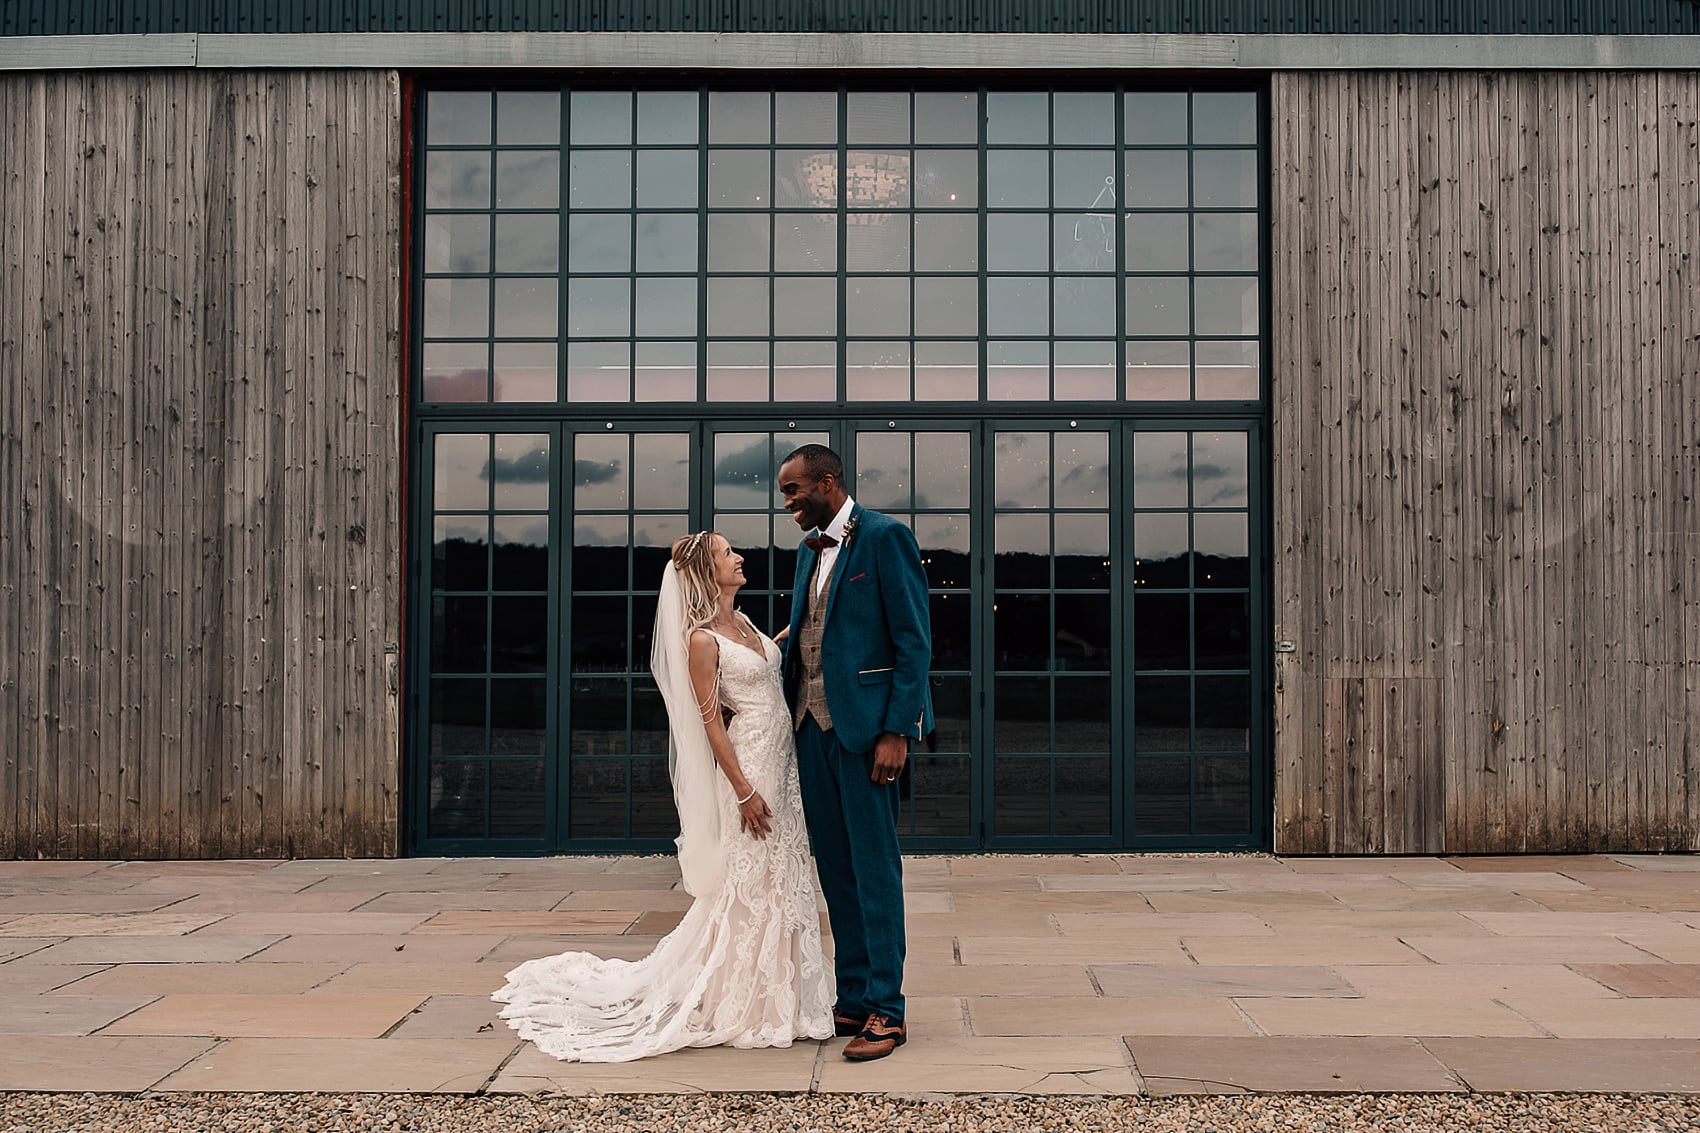 Wharfedale Grange wedding photography